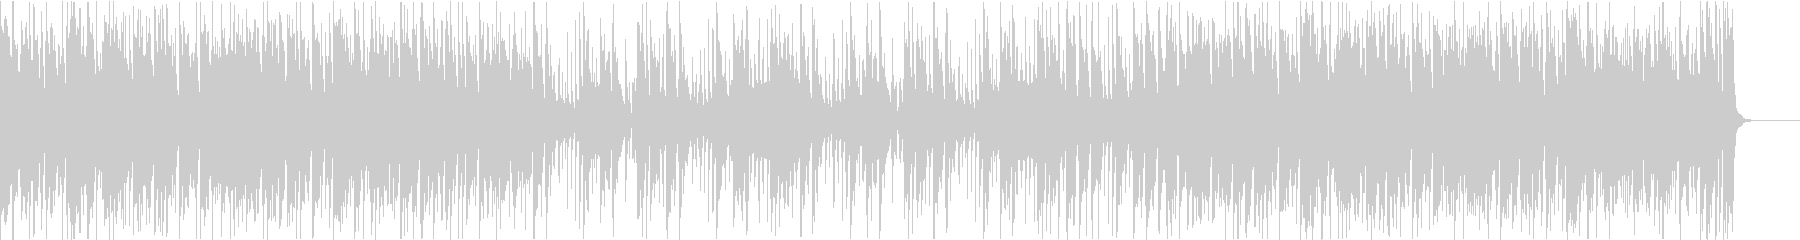 Ikeike / Fast Jazz / Karaoke's unreproduced waveform